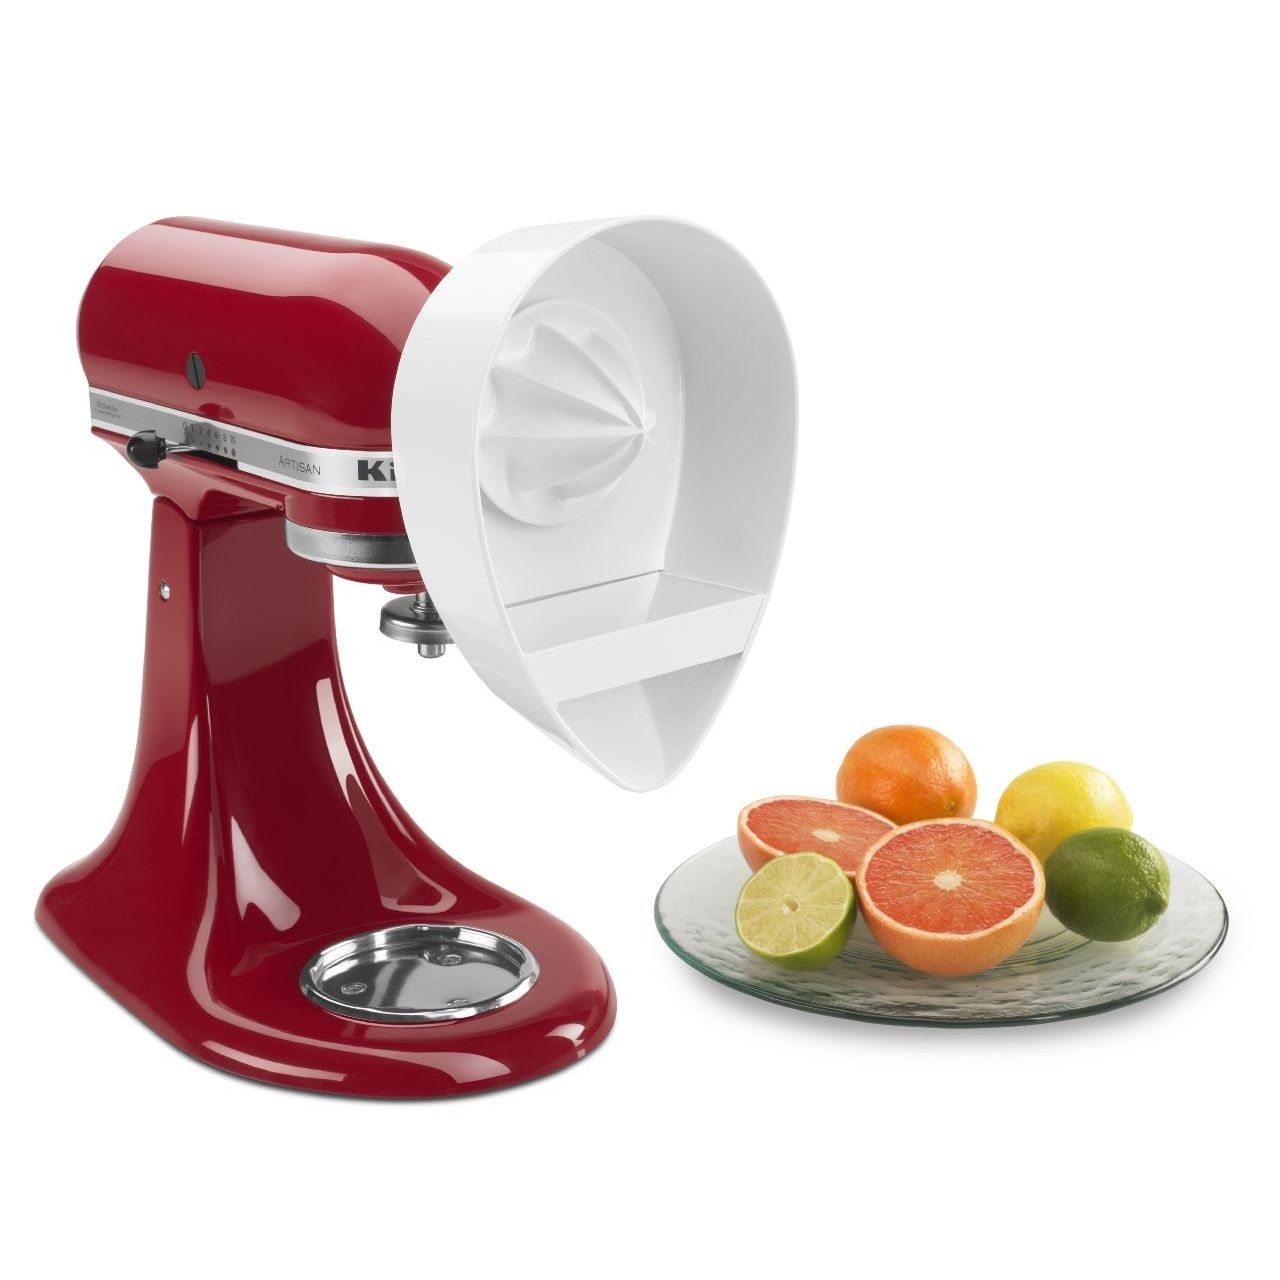 Kitchenaid mixer attachments various things i want